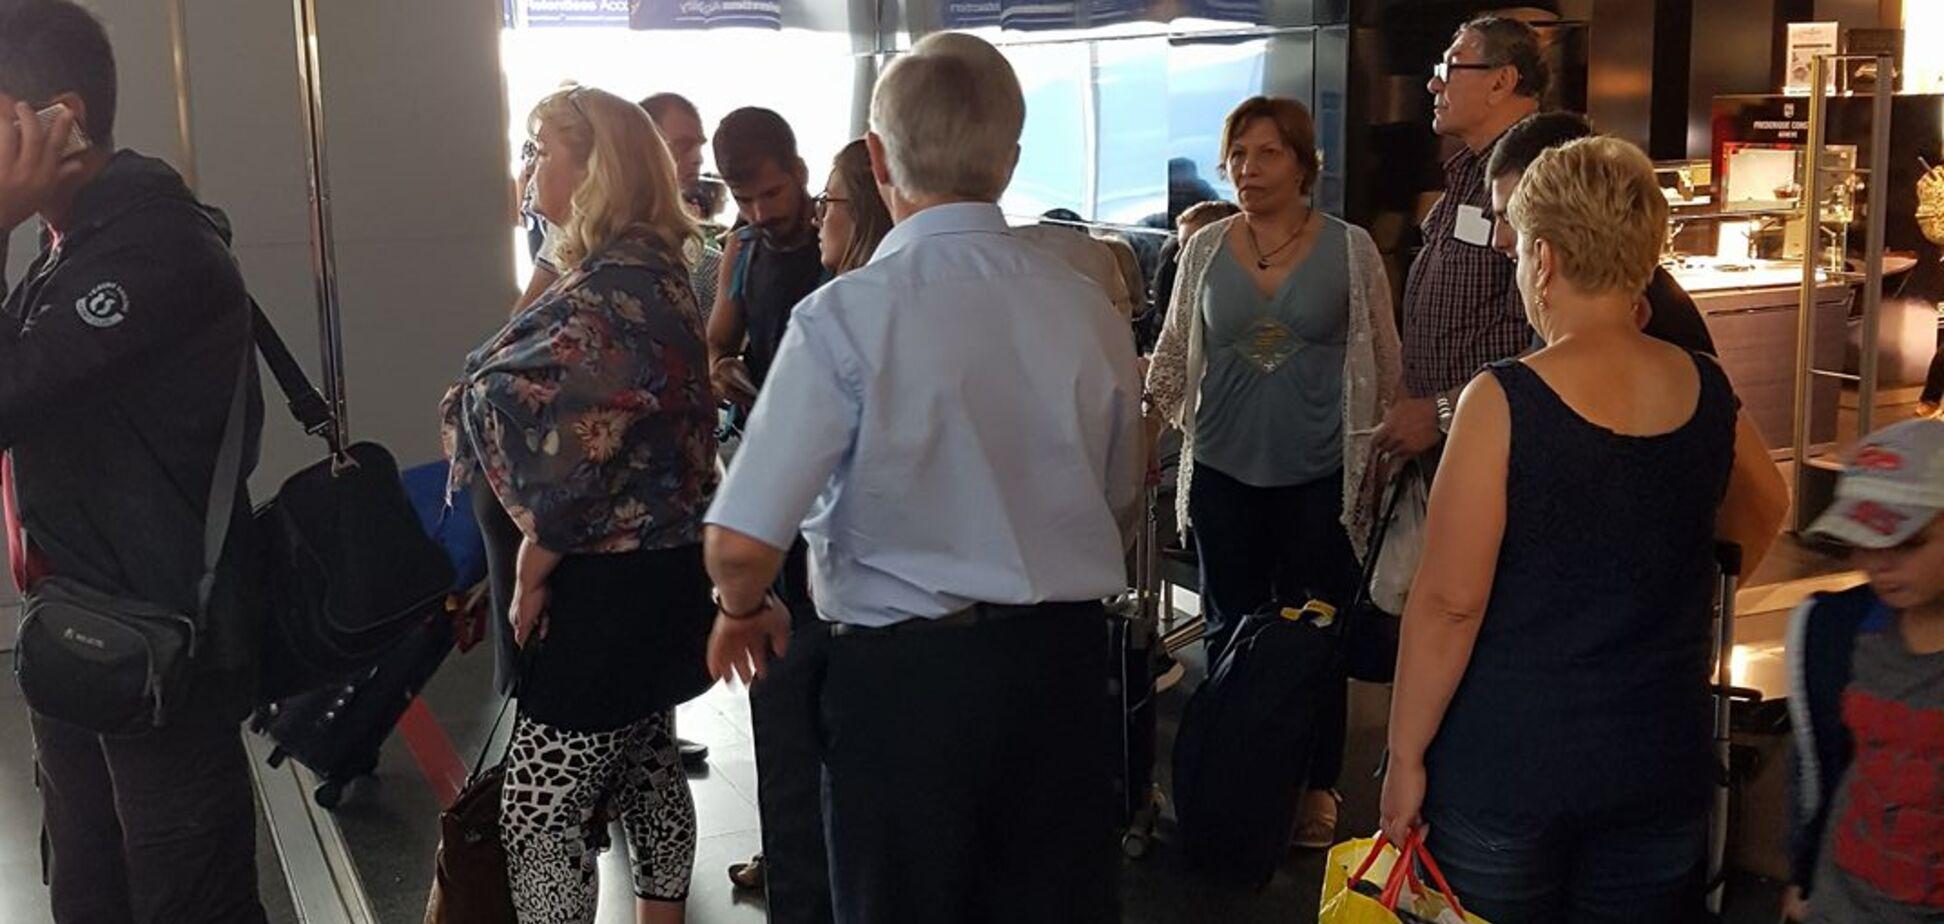 Зачастил: коммуниста Симоненко засекли в аэропорту на пути в Испанию